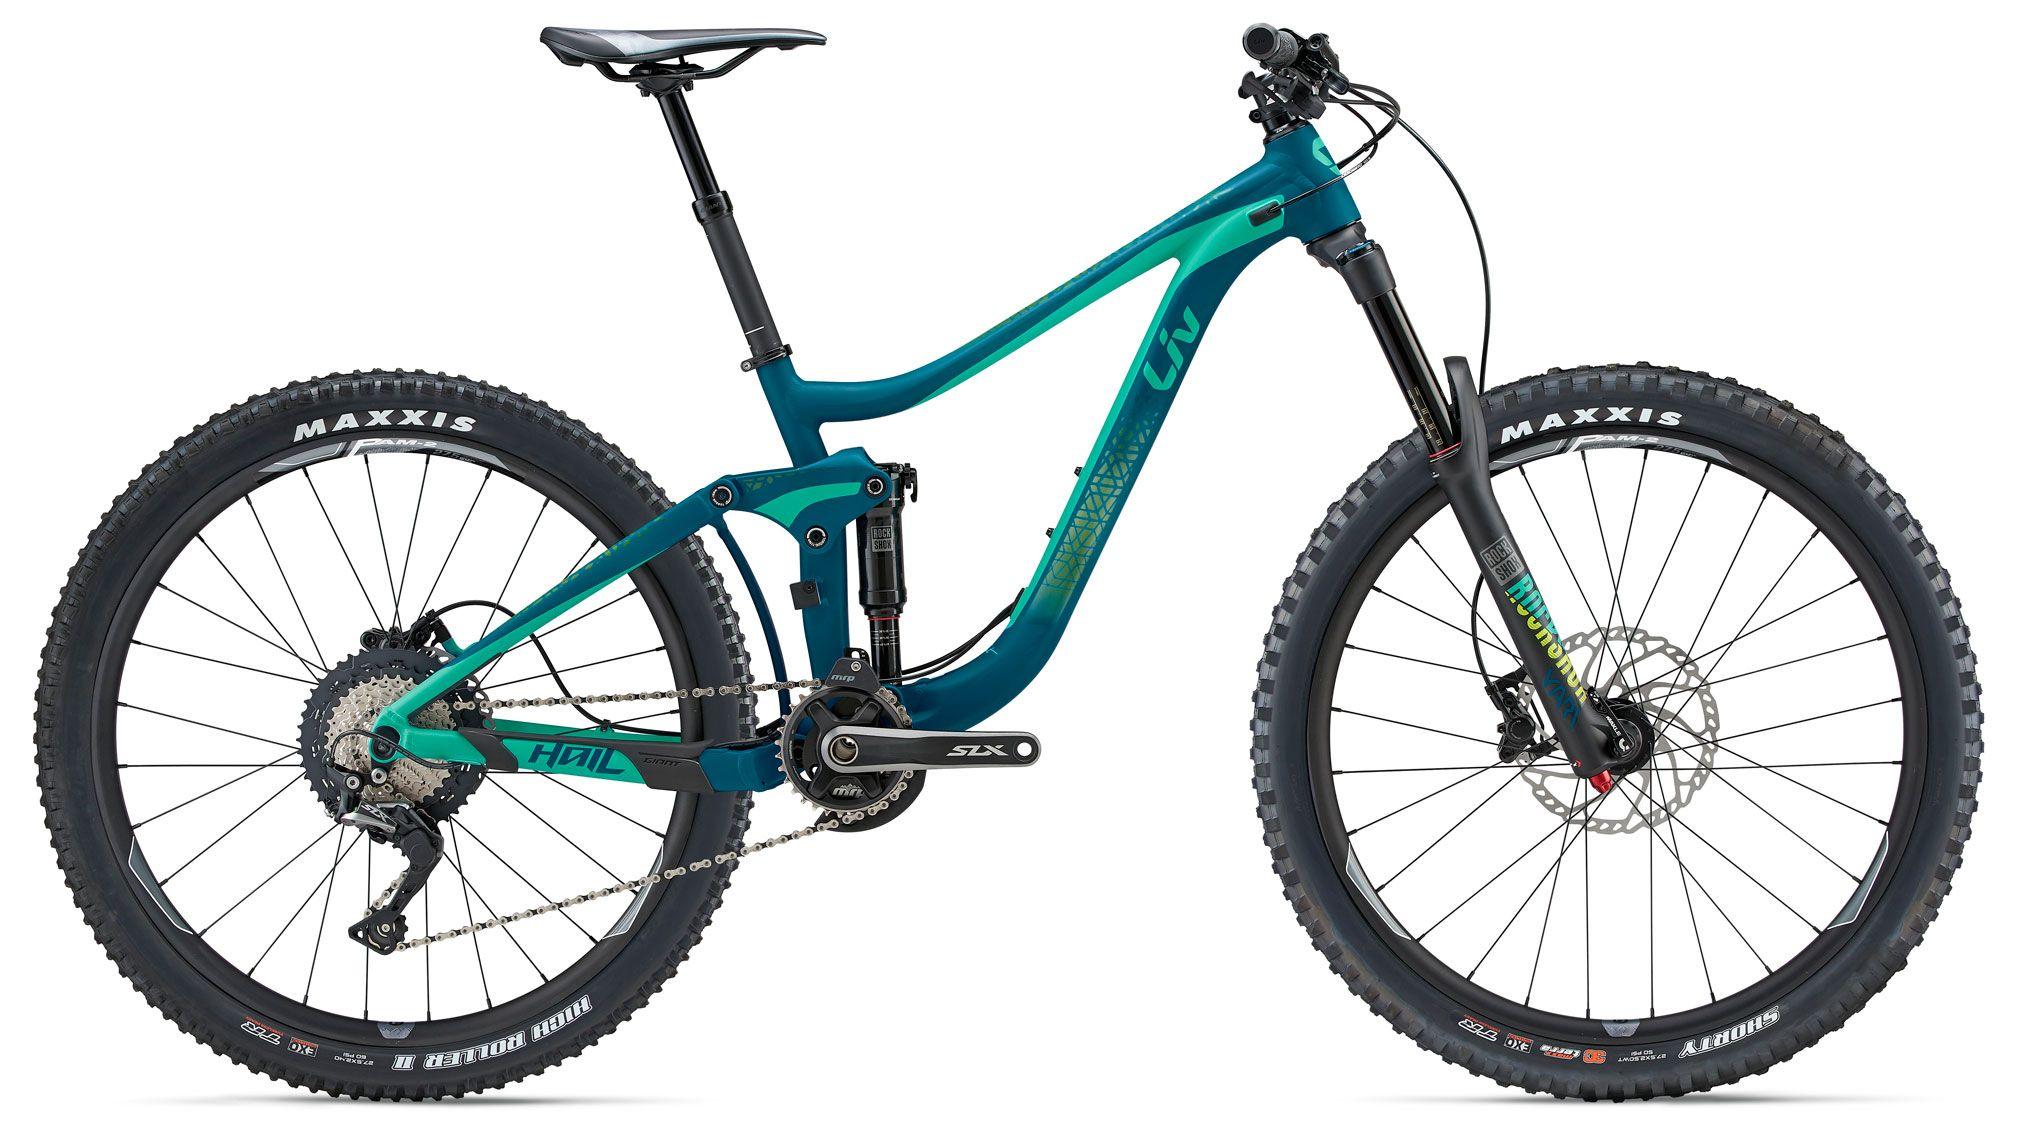 Велосипед Giant Hail 2 2018 велосипед giant tcr advanced 2 compact 2013